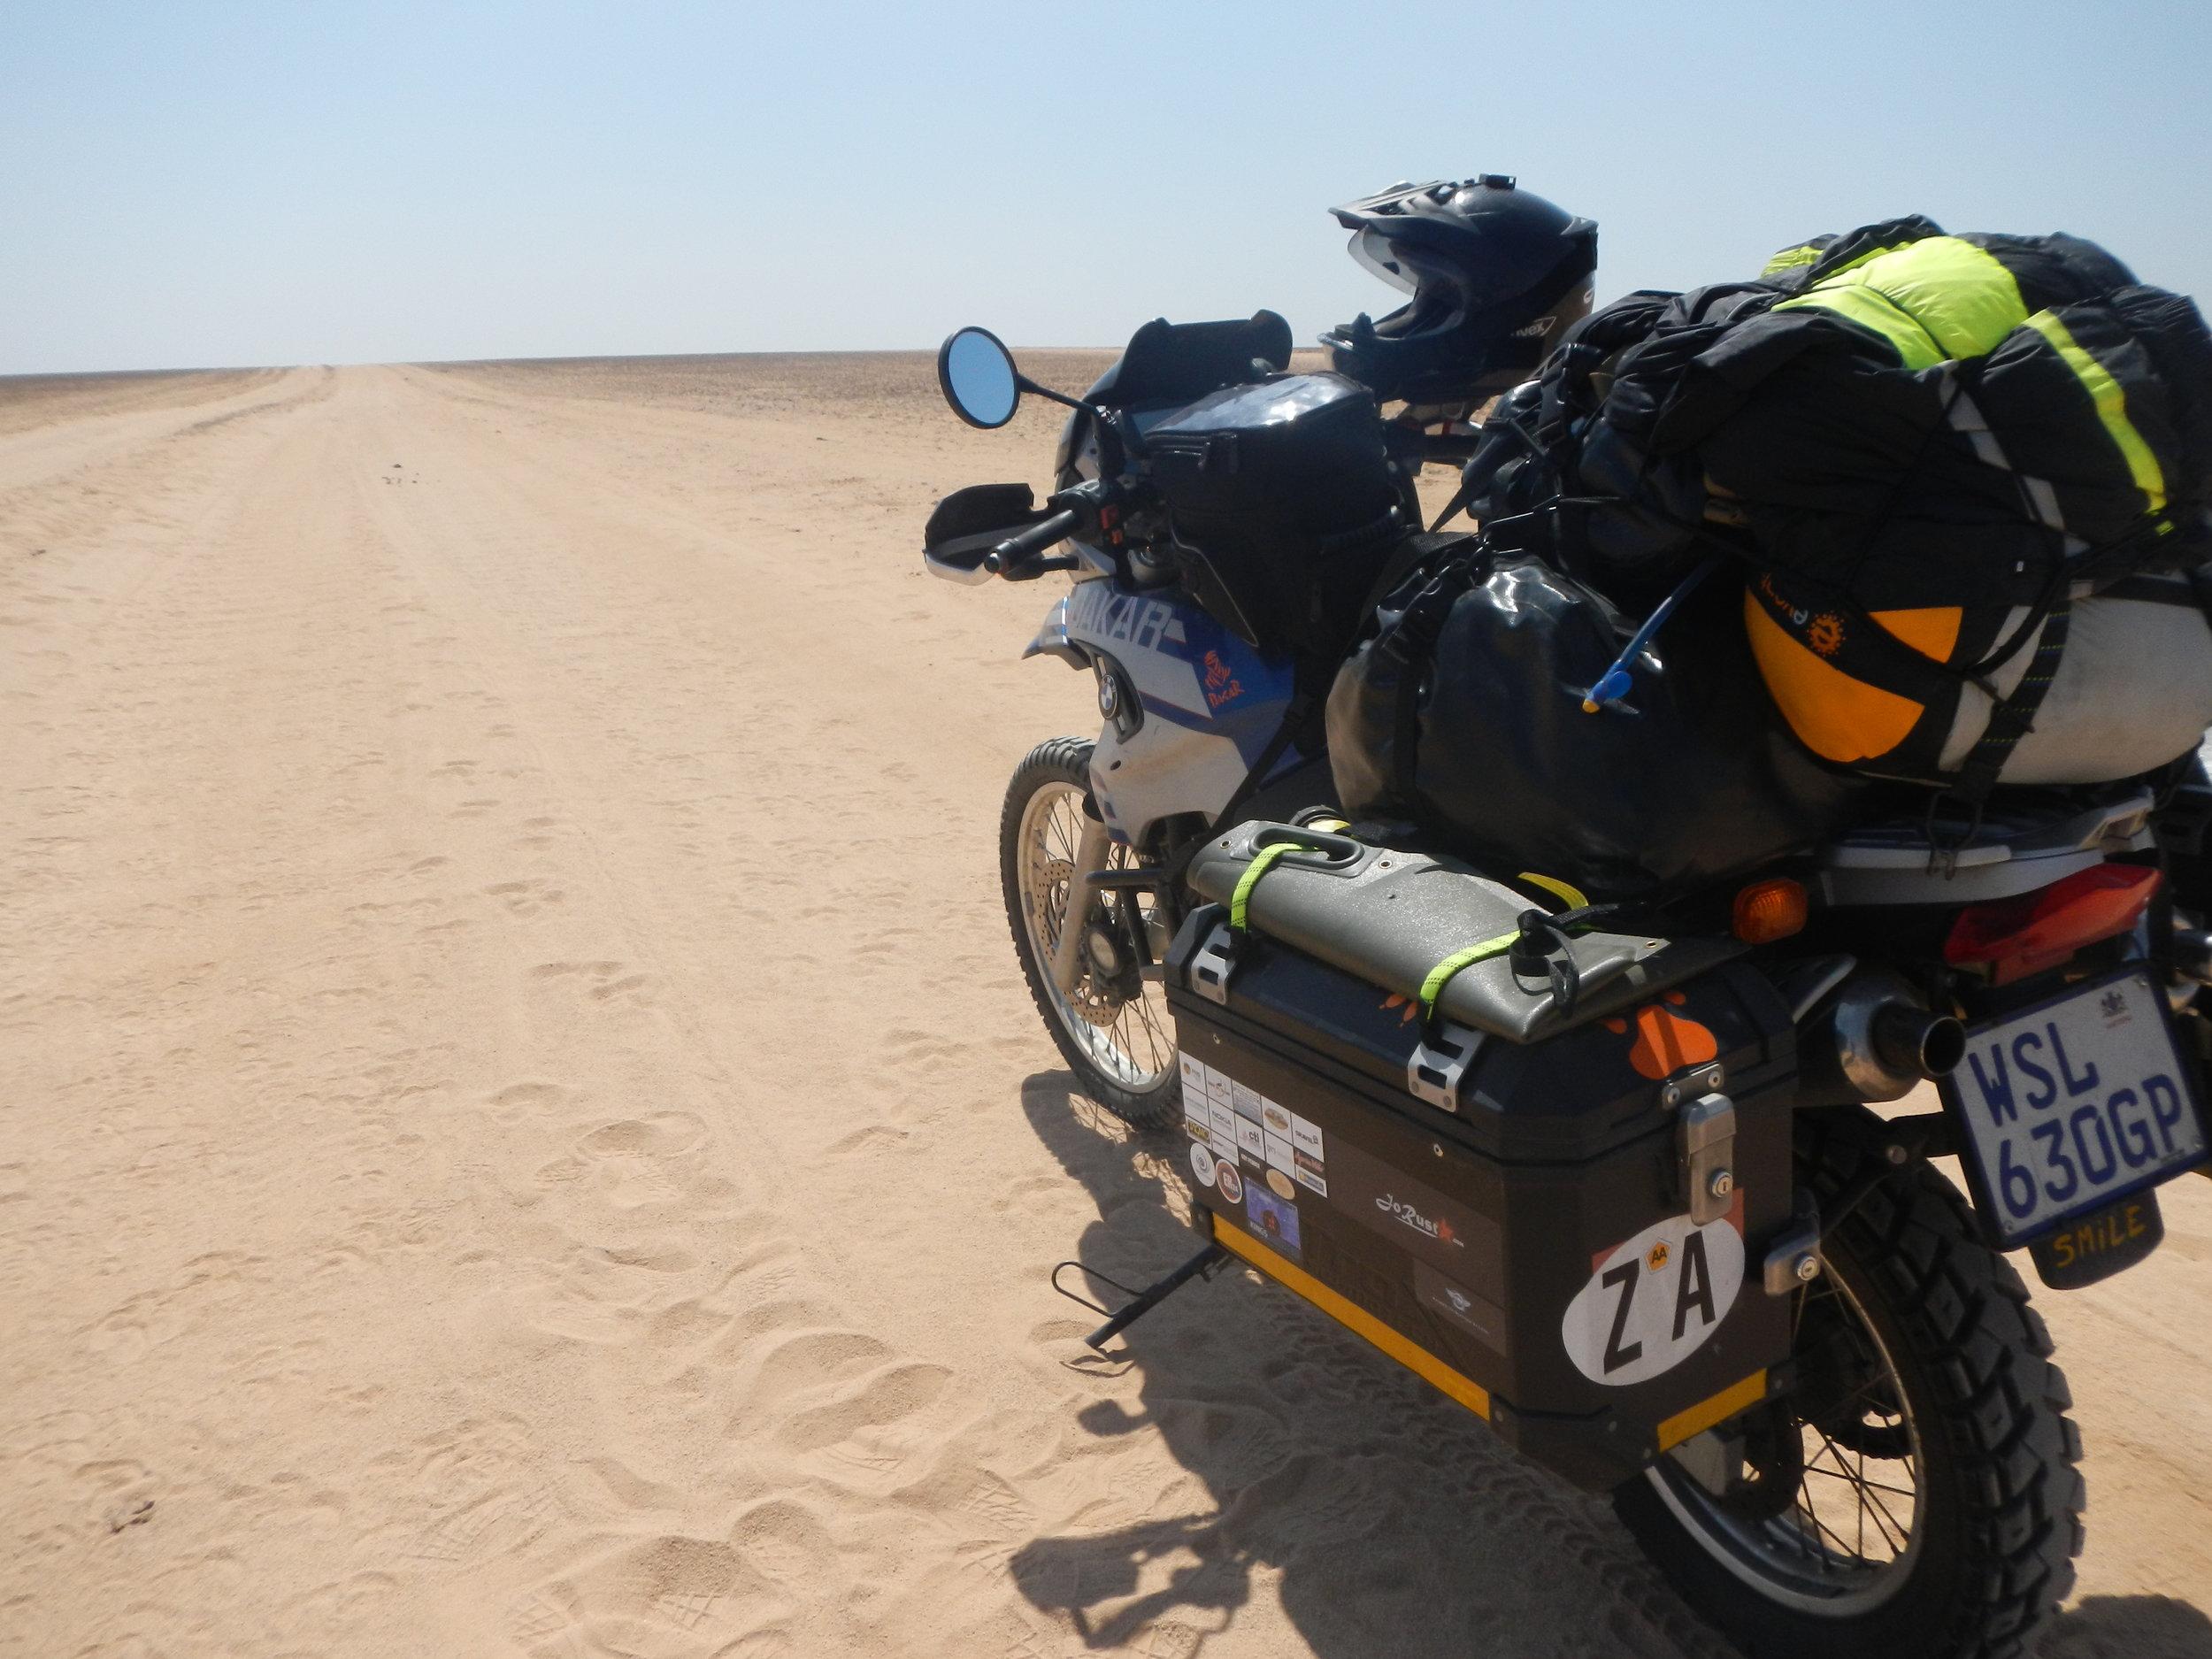 Jo-Rust-Adventure-Rider-Radio-Motorcycle-Podcast-4.JPG